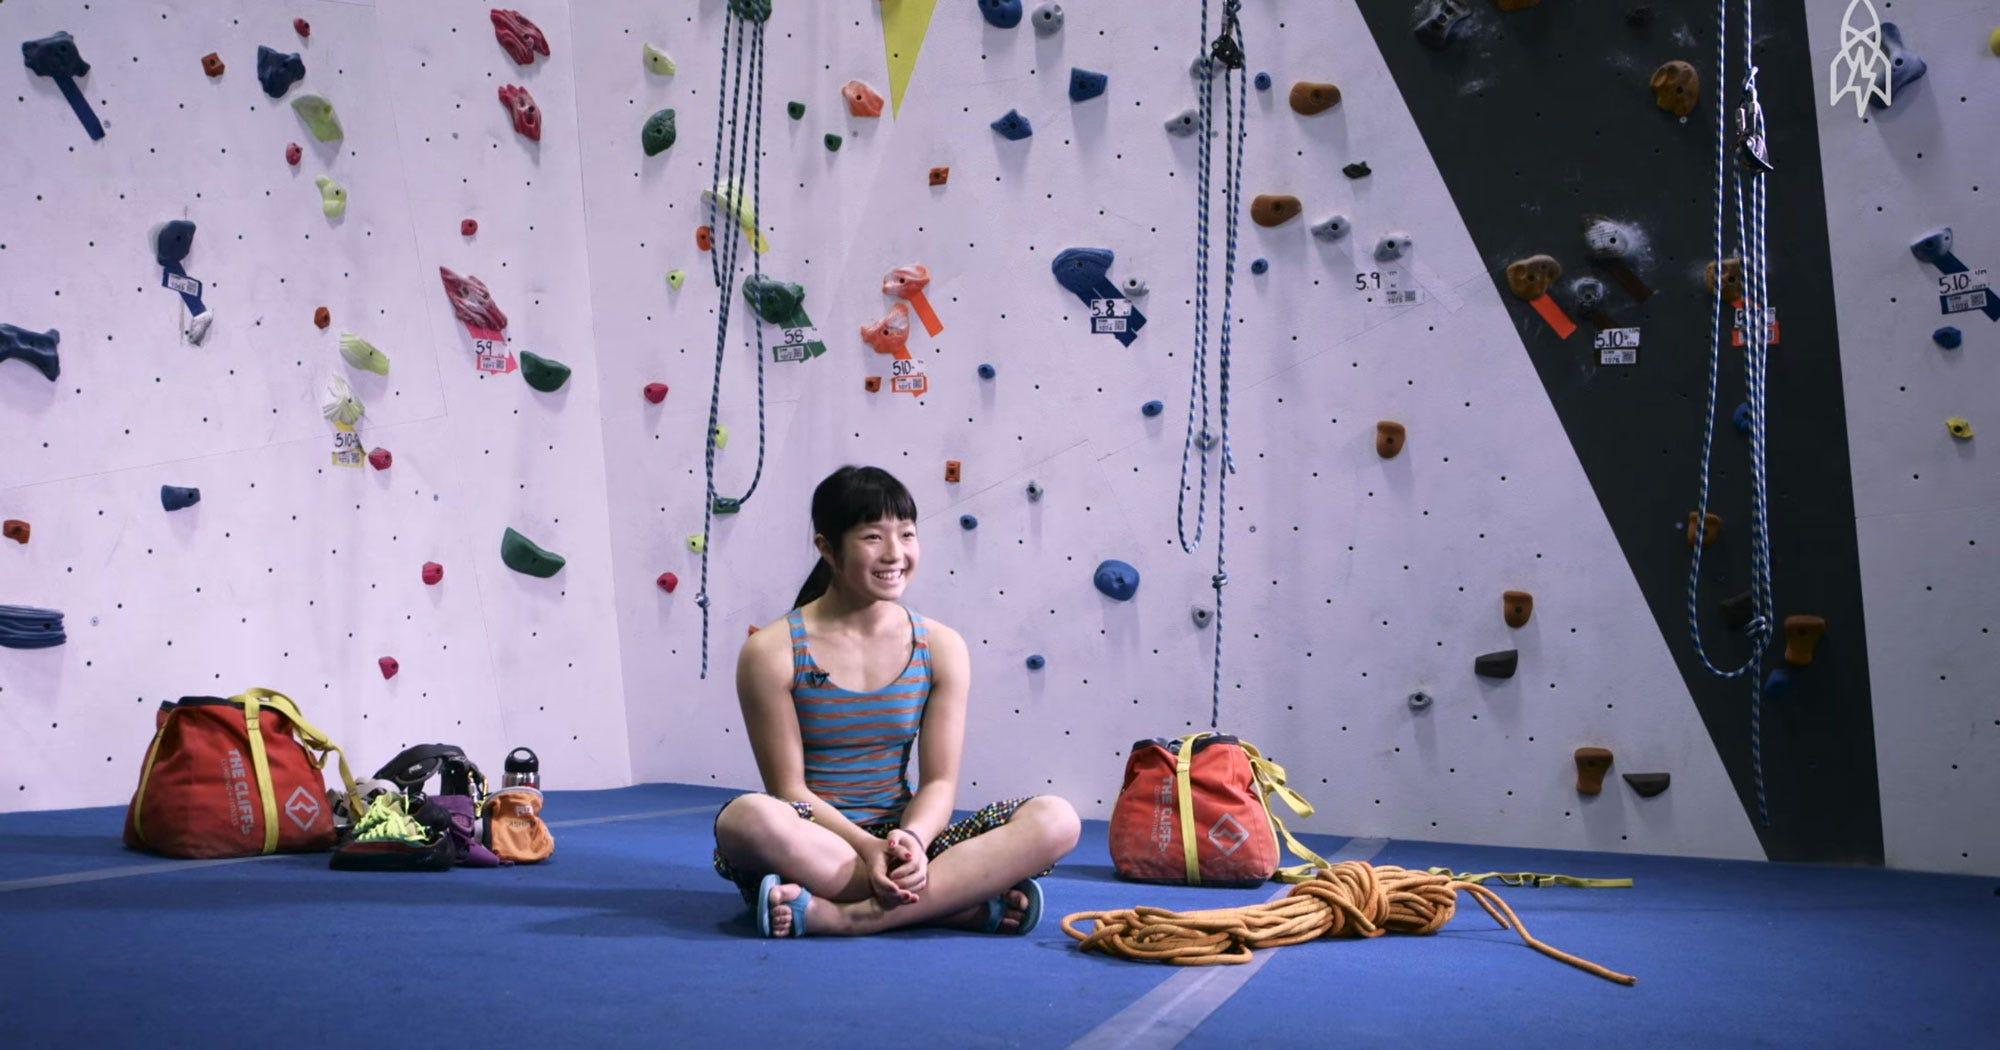 Ashima Shiraishi Best Woman Rock Climber